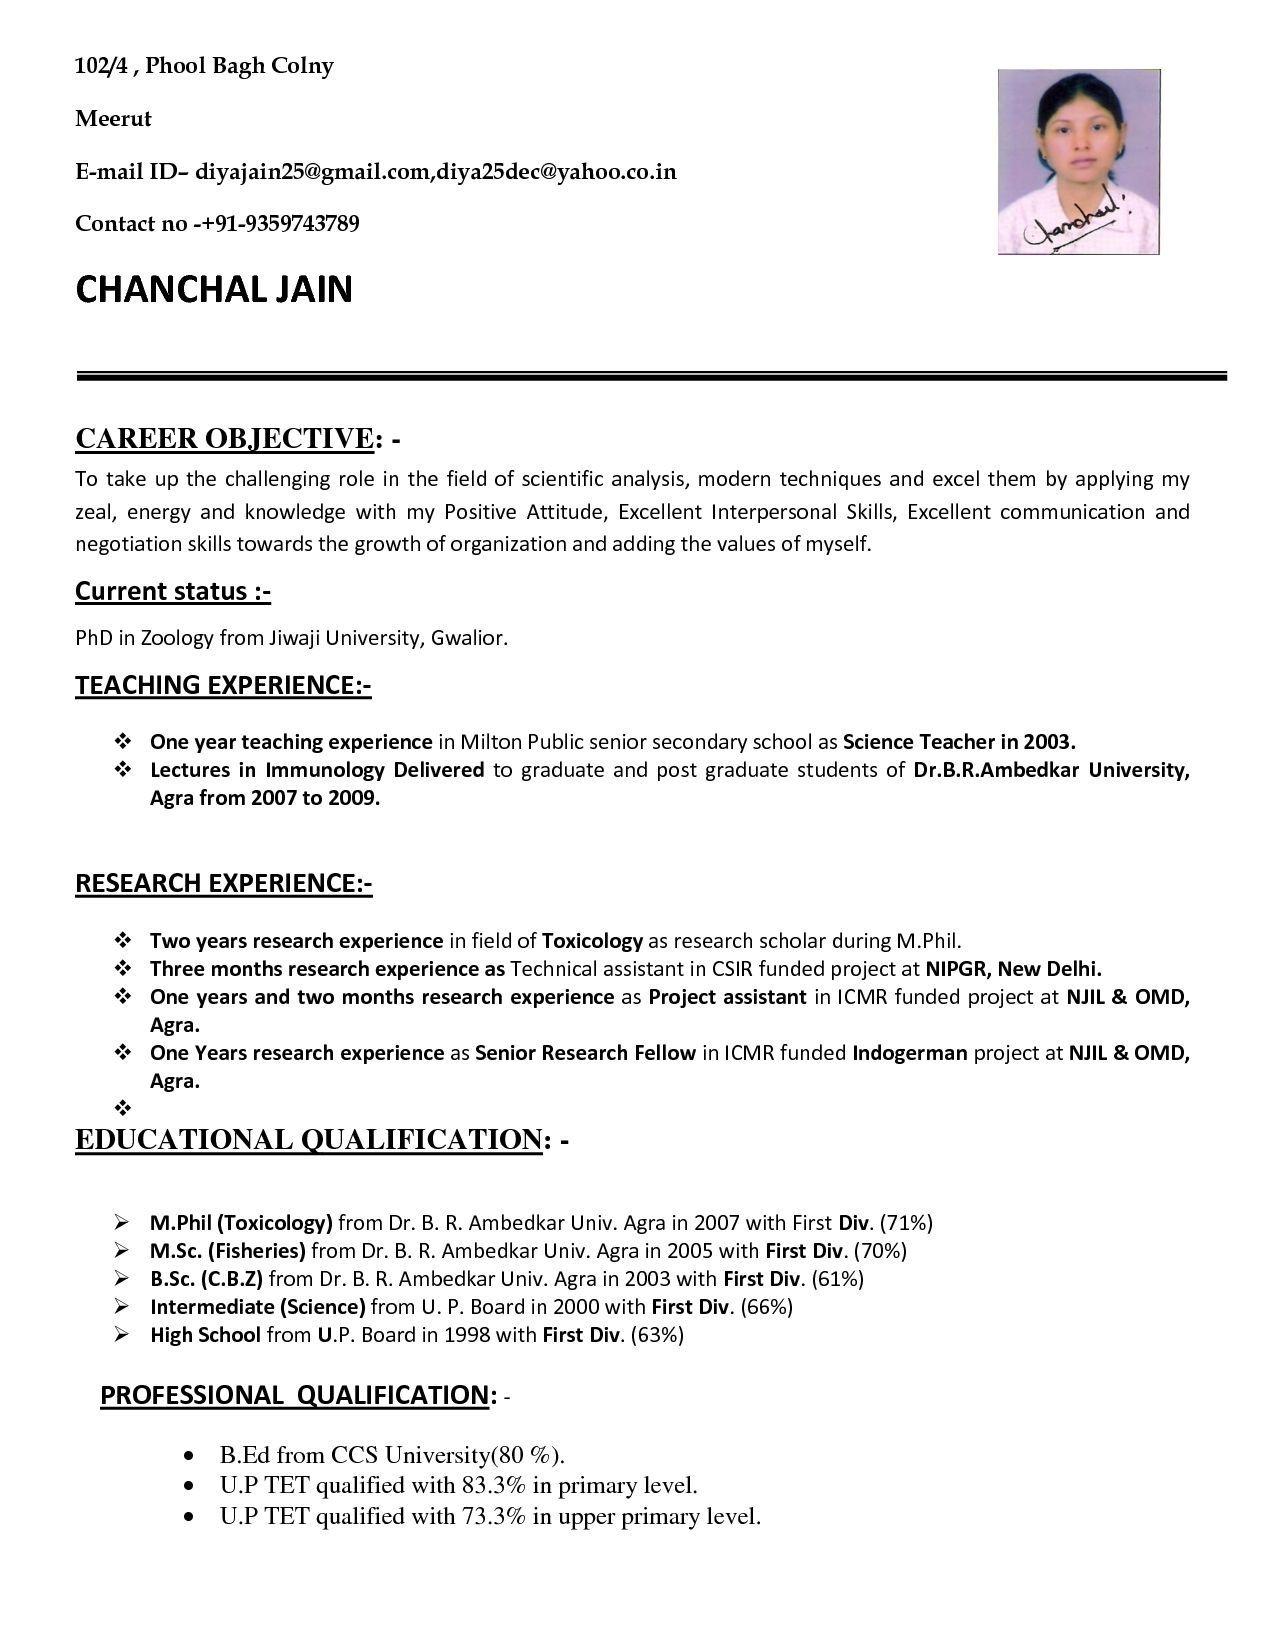 002 Awesome Resume Template For Teaching Job Sample  Cv In India Format Example TeacherFull